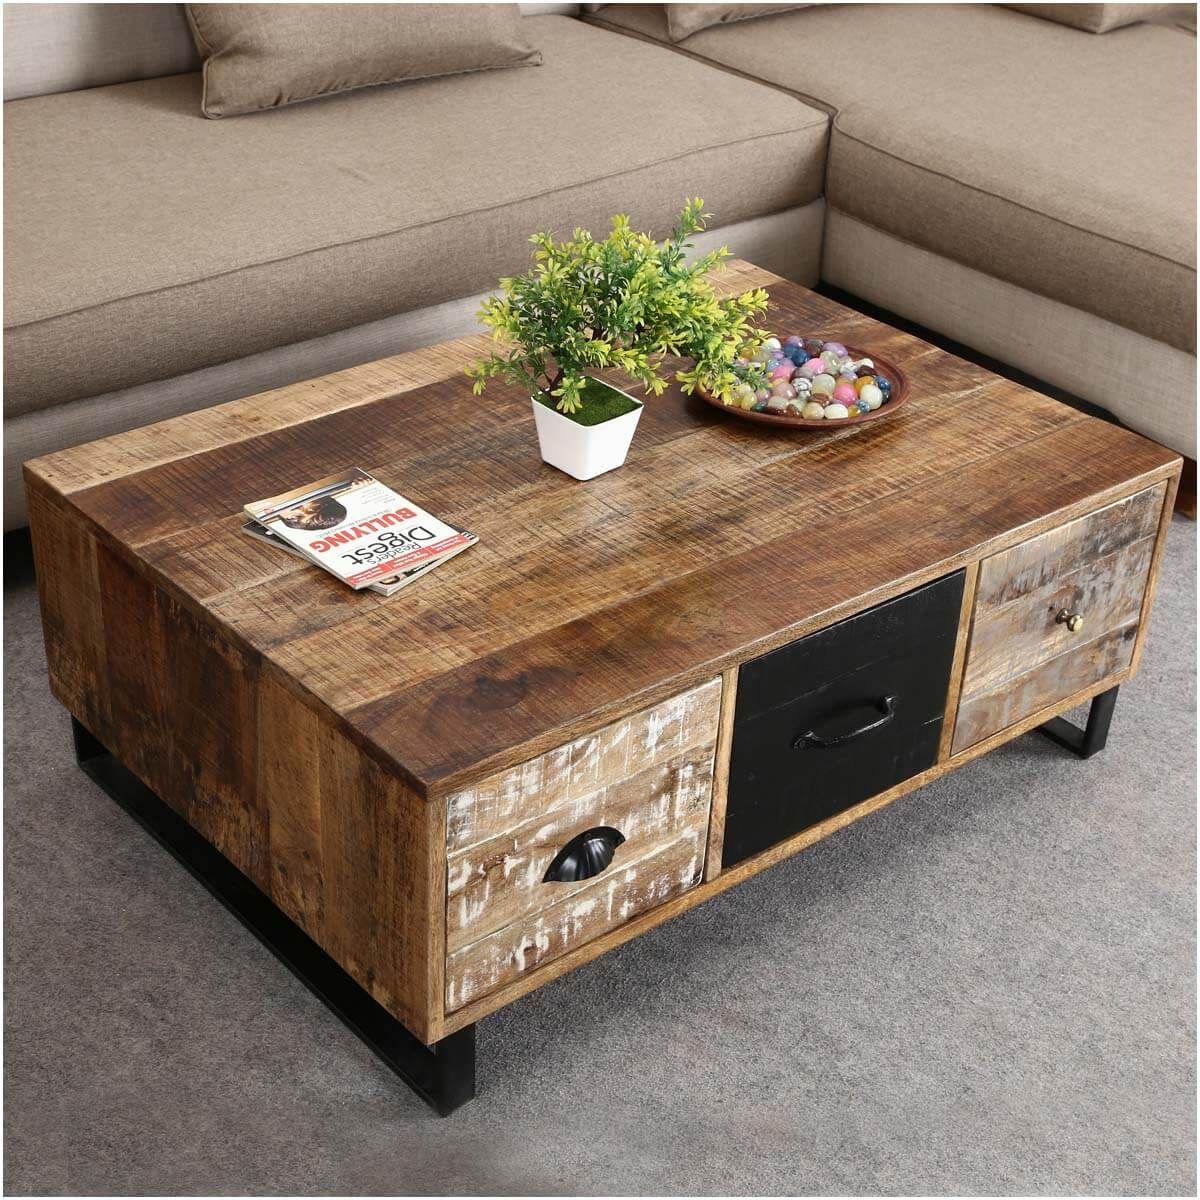 Industrial Pioneer Mango Wood Iron Coffee Table 3 Drawer Chest In 2021 Iron Coffee Table Coffee Table Quirky Furniture [ 1200 x 1200 Pixel ]